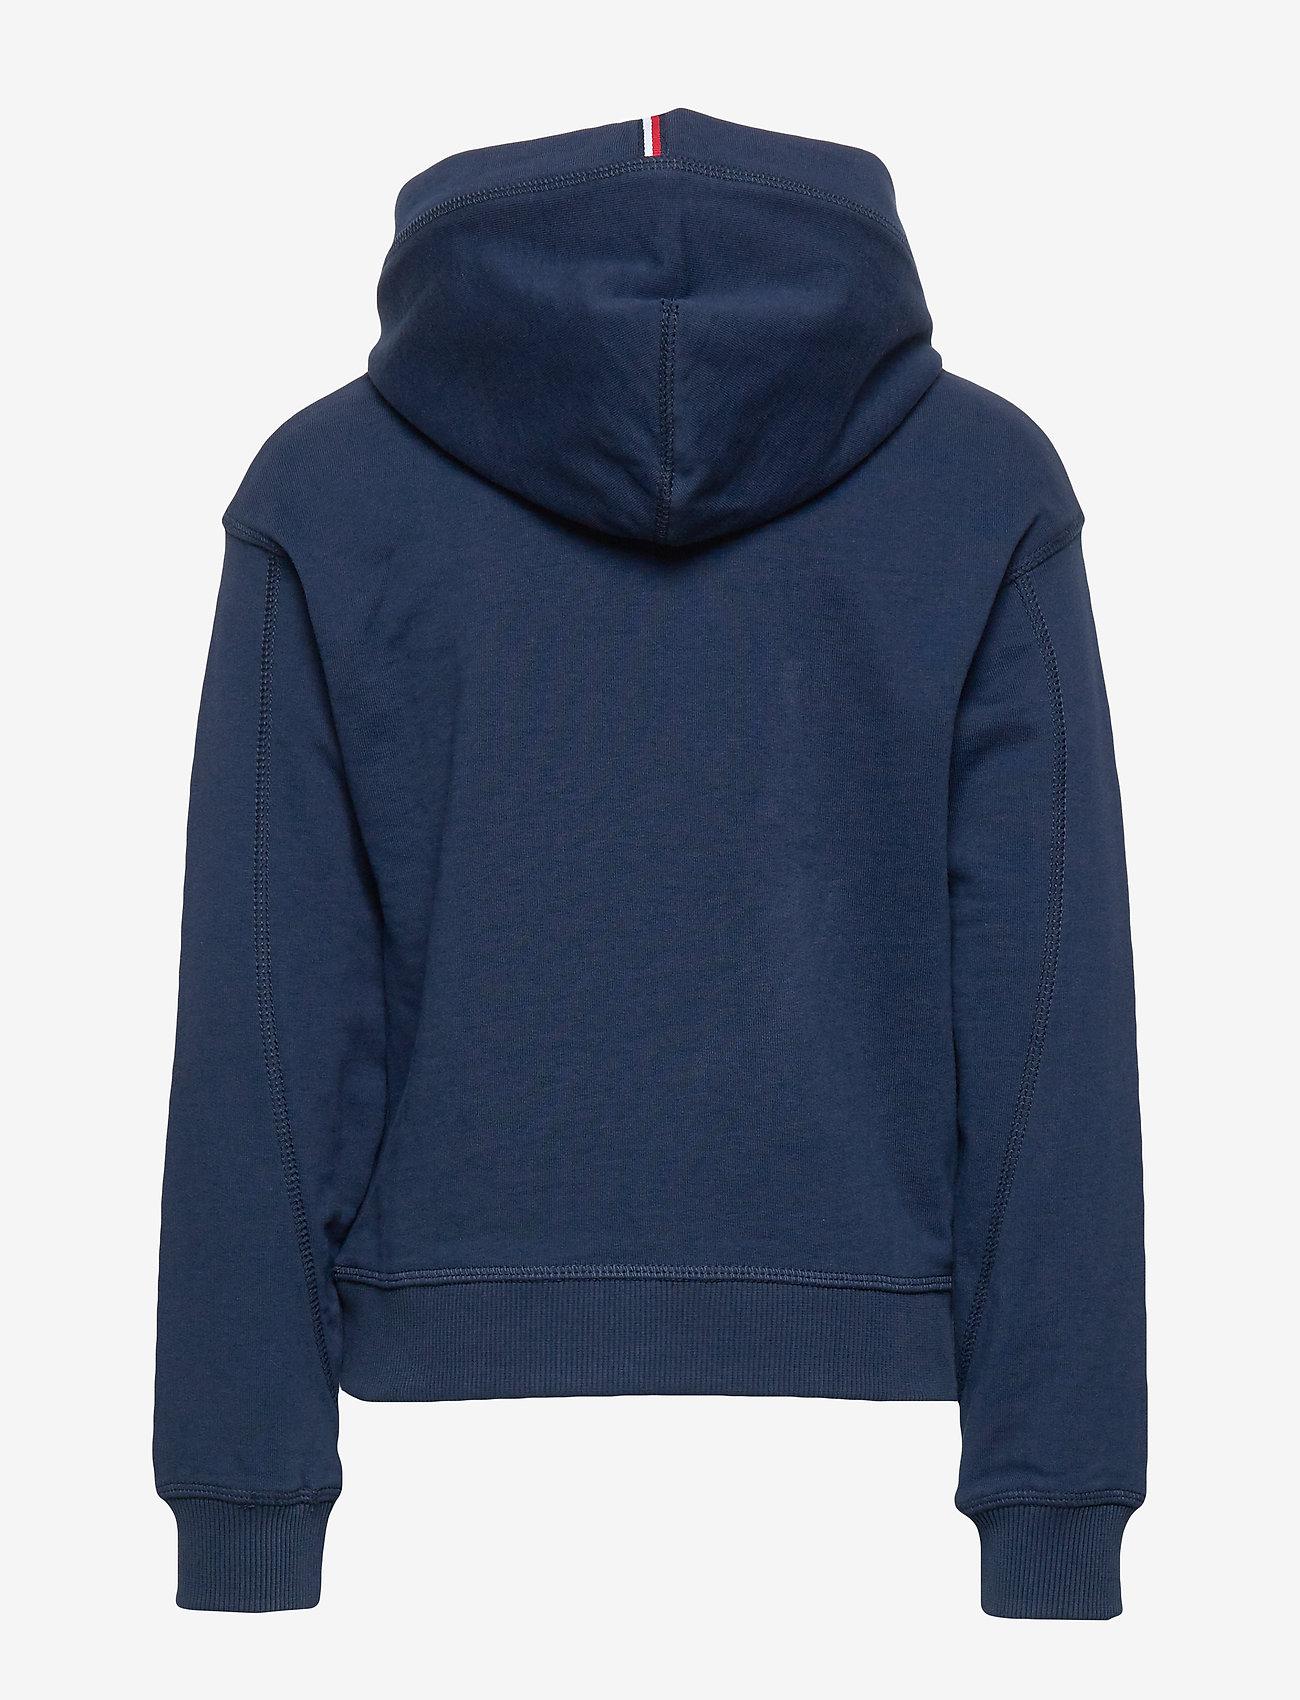 Tommy Hilfiger - ESSENTIAL HOODED SWE - hoodies - twilight navy